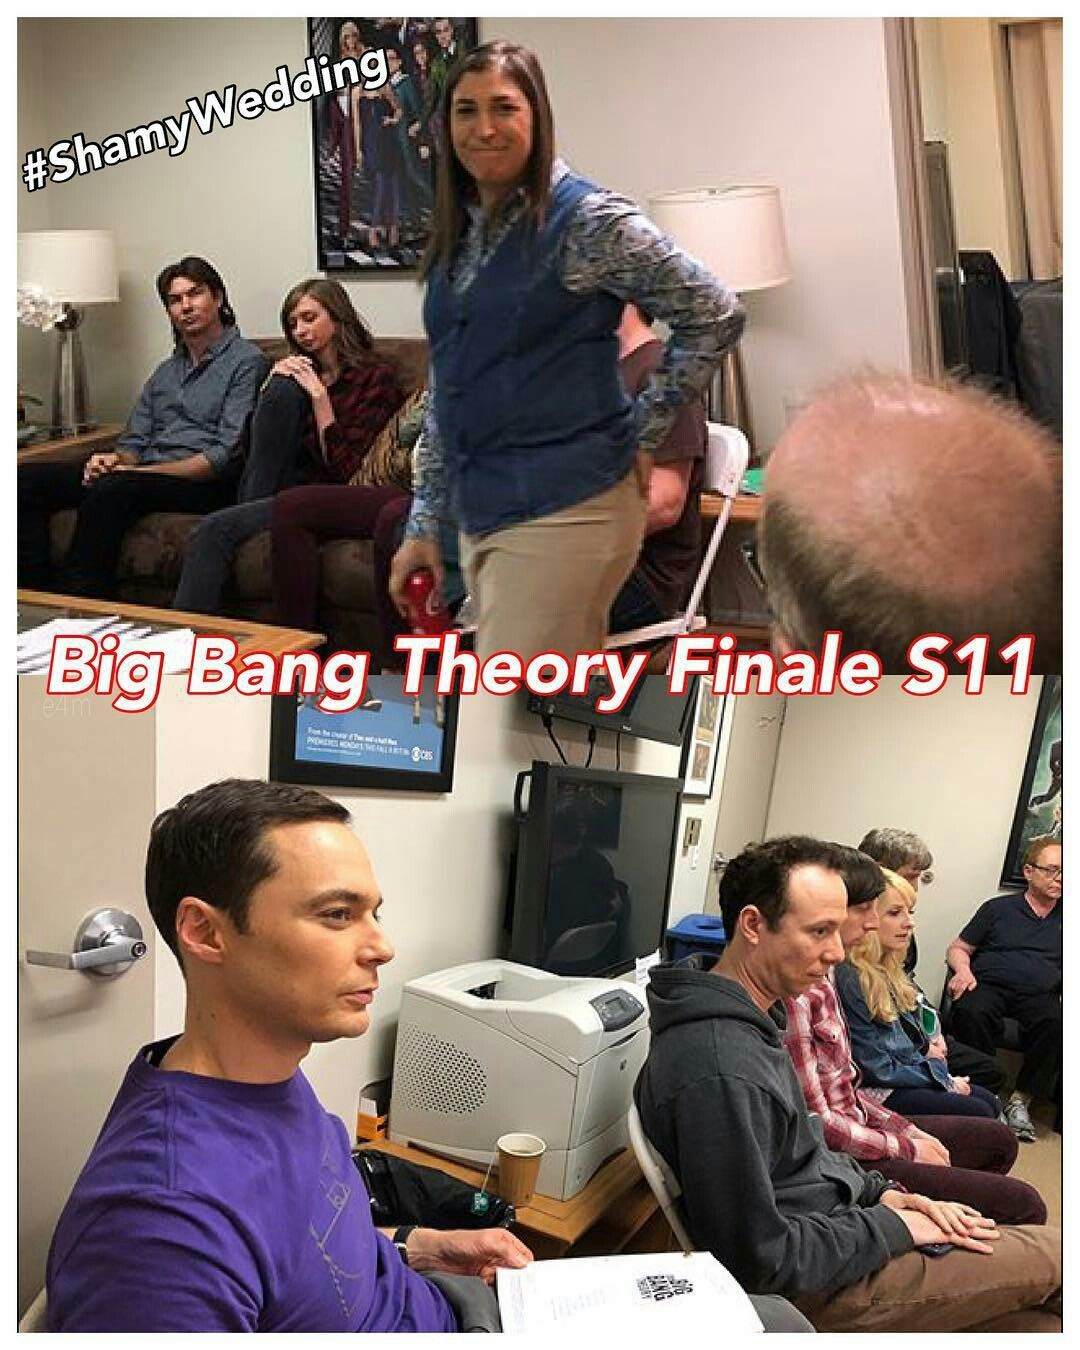 anja andersen citater Pin af Anja Andersen på Big bang theory anja andersen citater